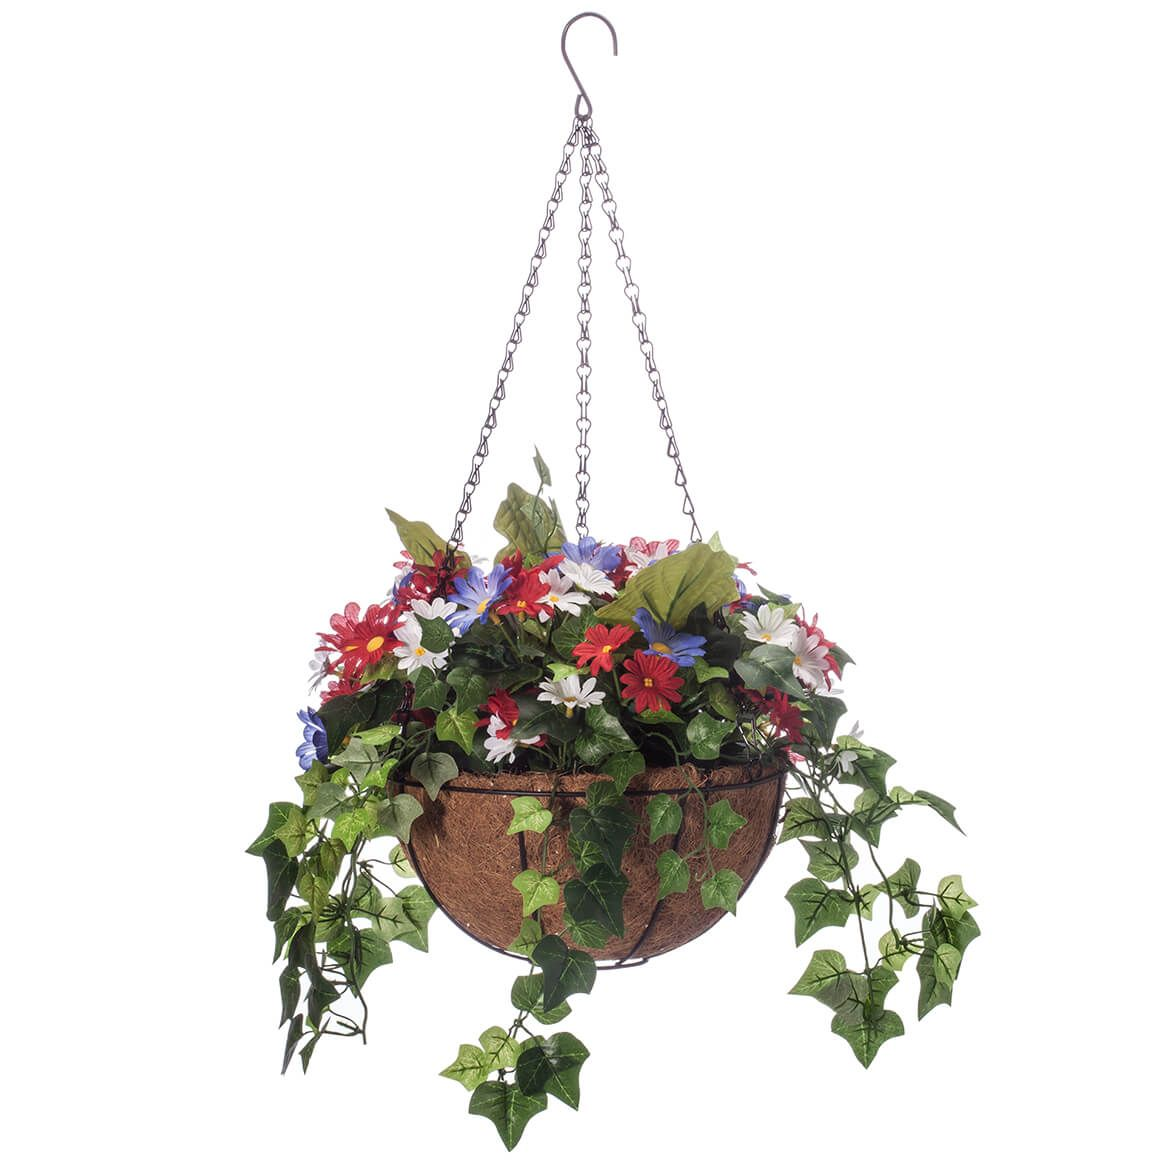 Daisy and Greenery Lighted Basket by OakRidge™-362225